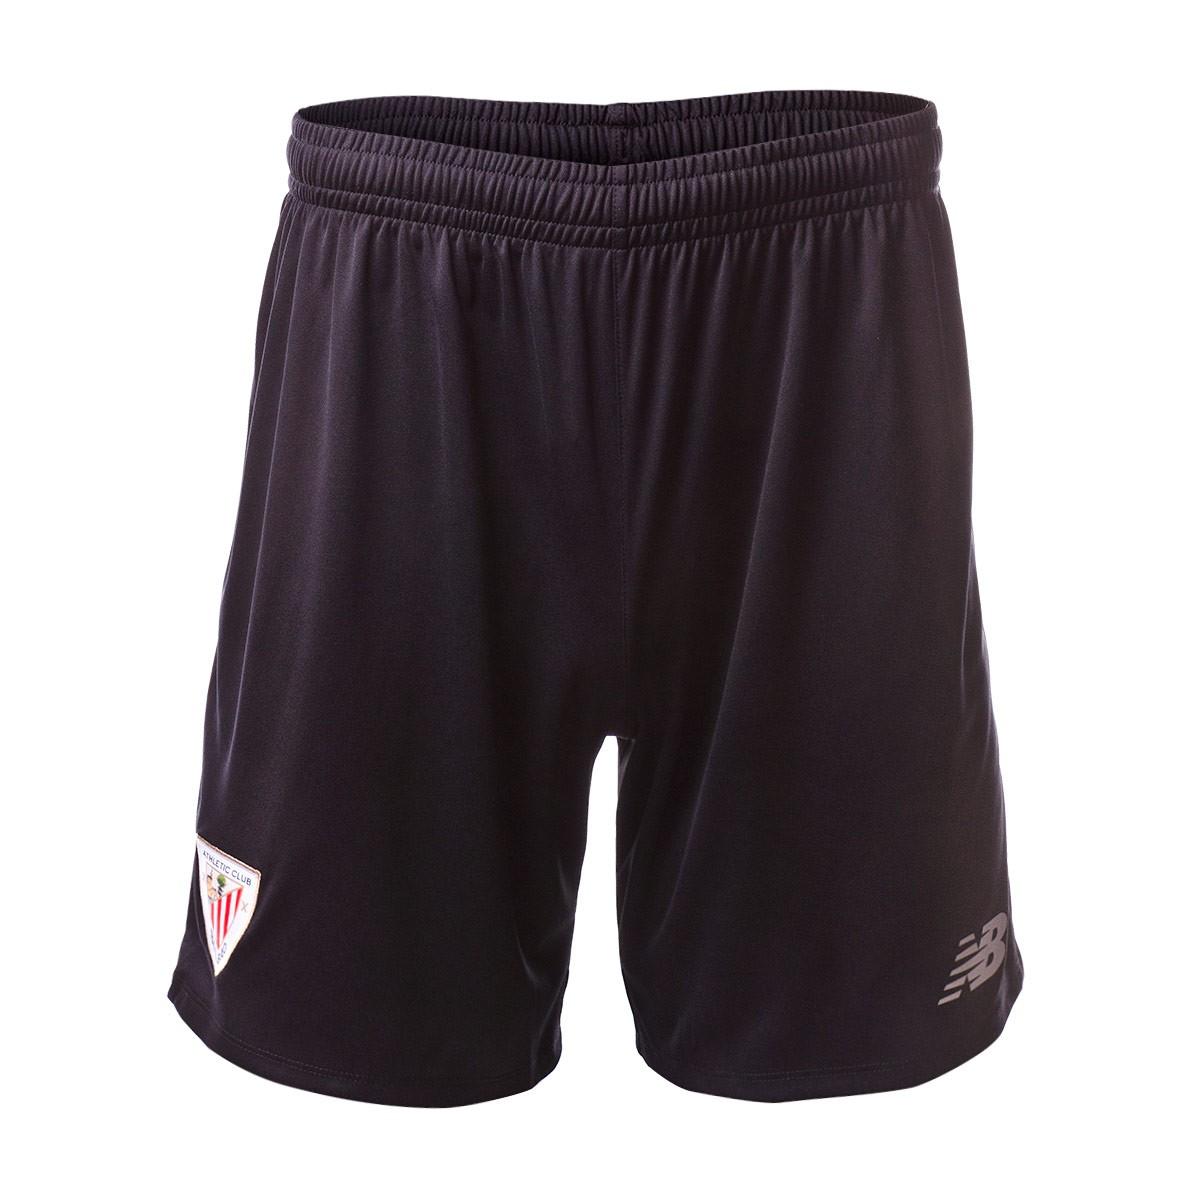 New Balance Pantal/ón corto AC Bilbao Primera Equipaci/ón 2018-2019 Black